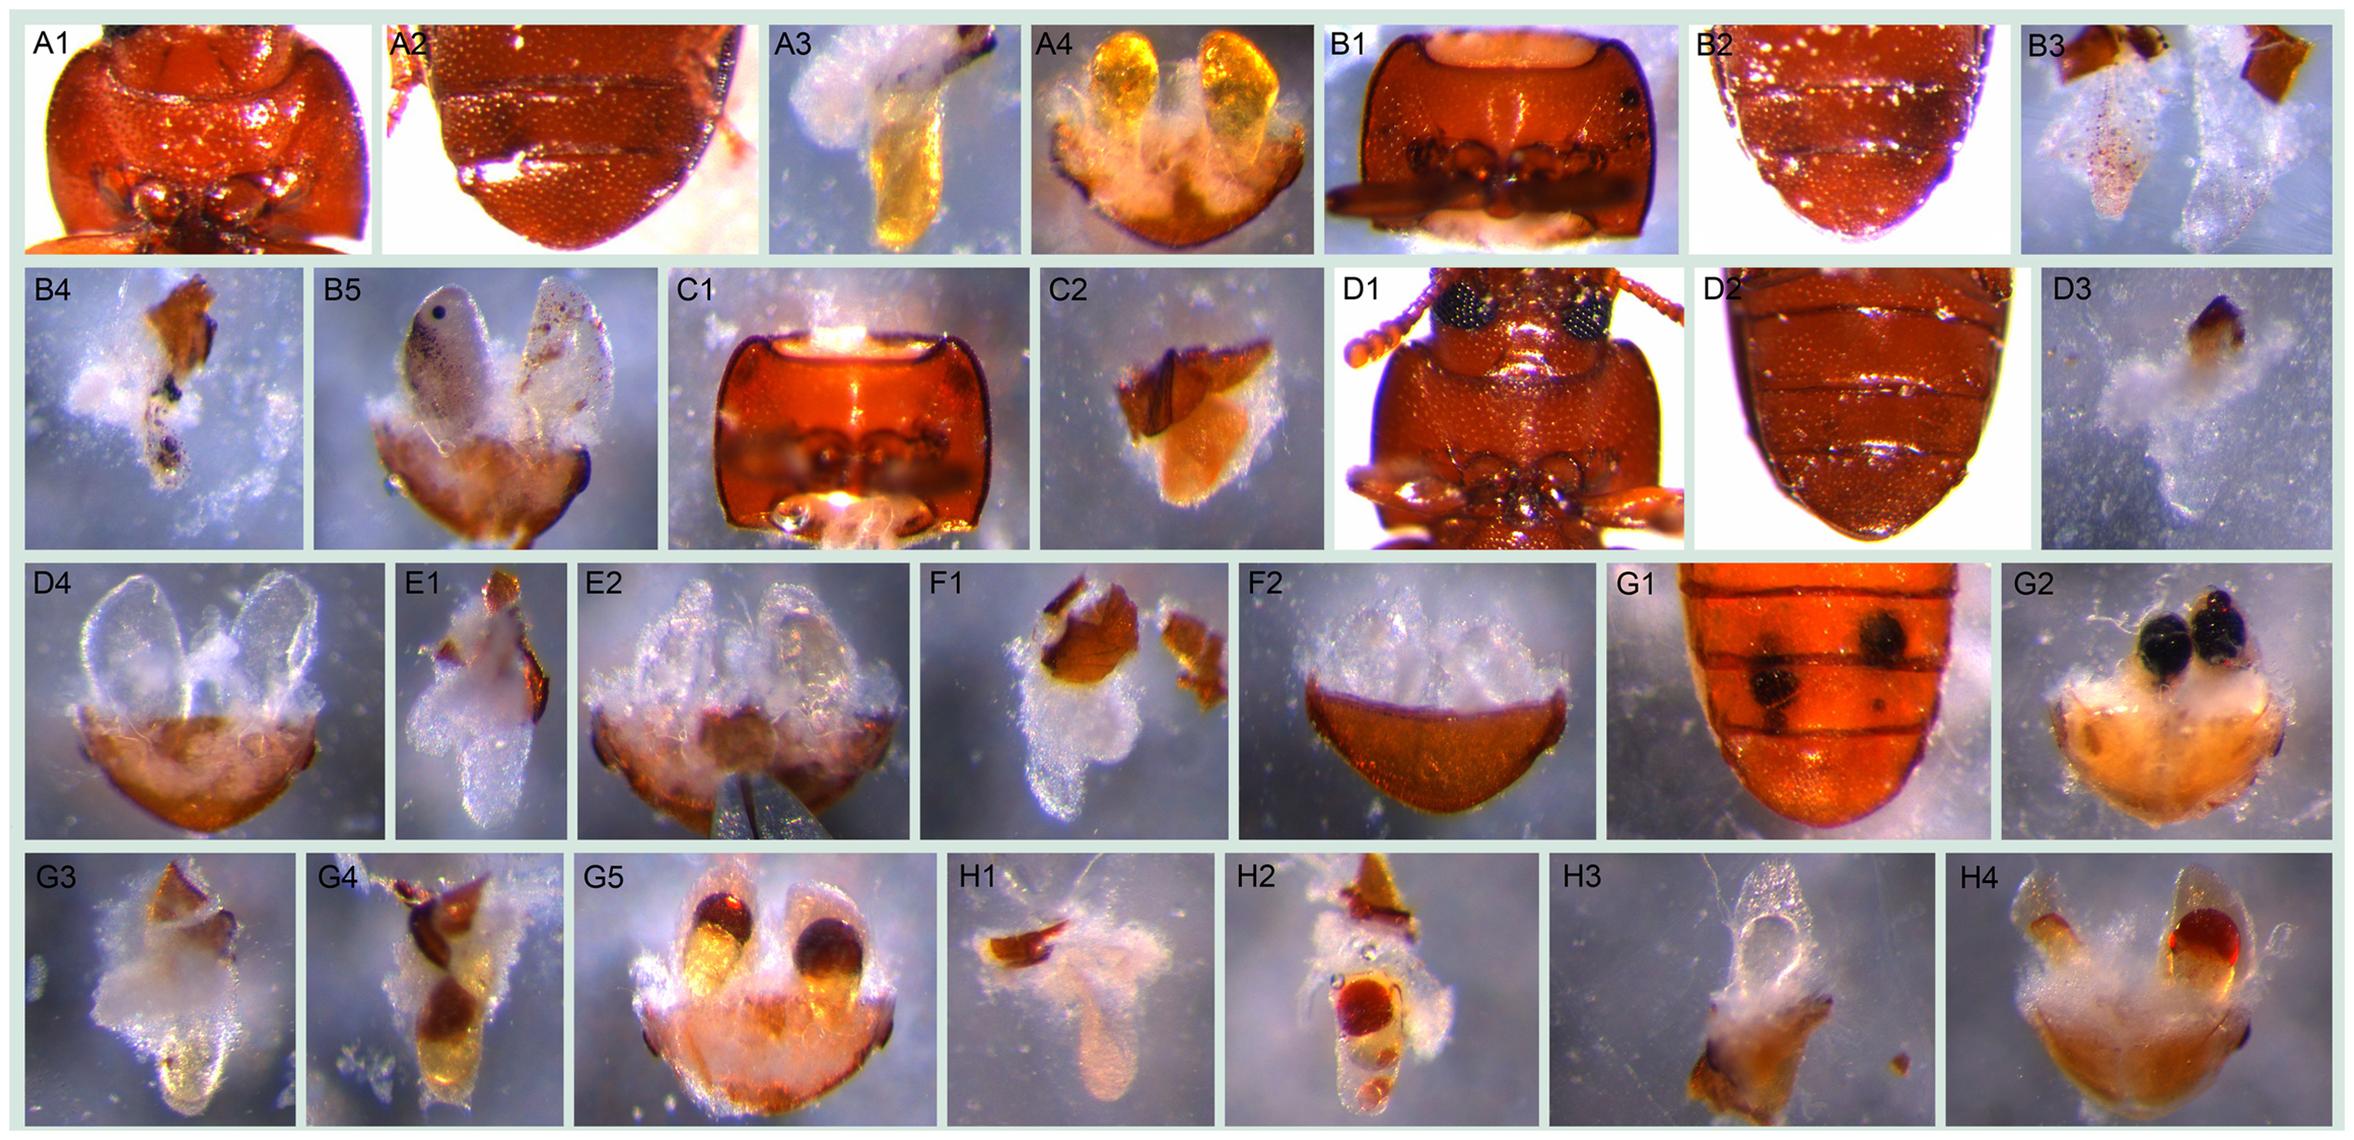 Visible morphological gland phenotypes after RNAi.